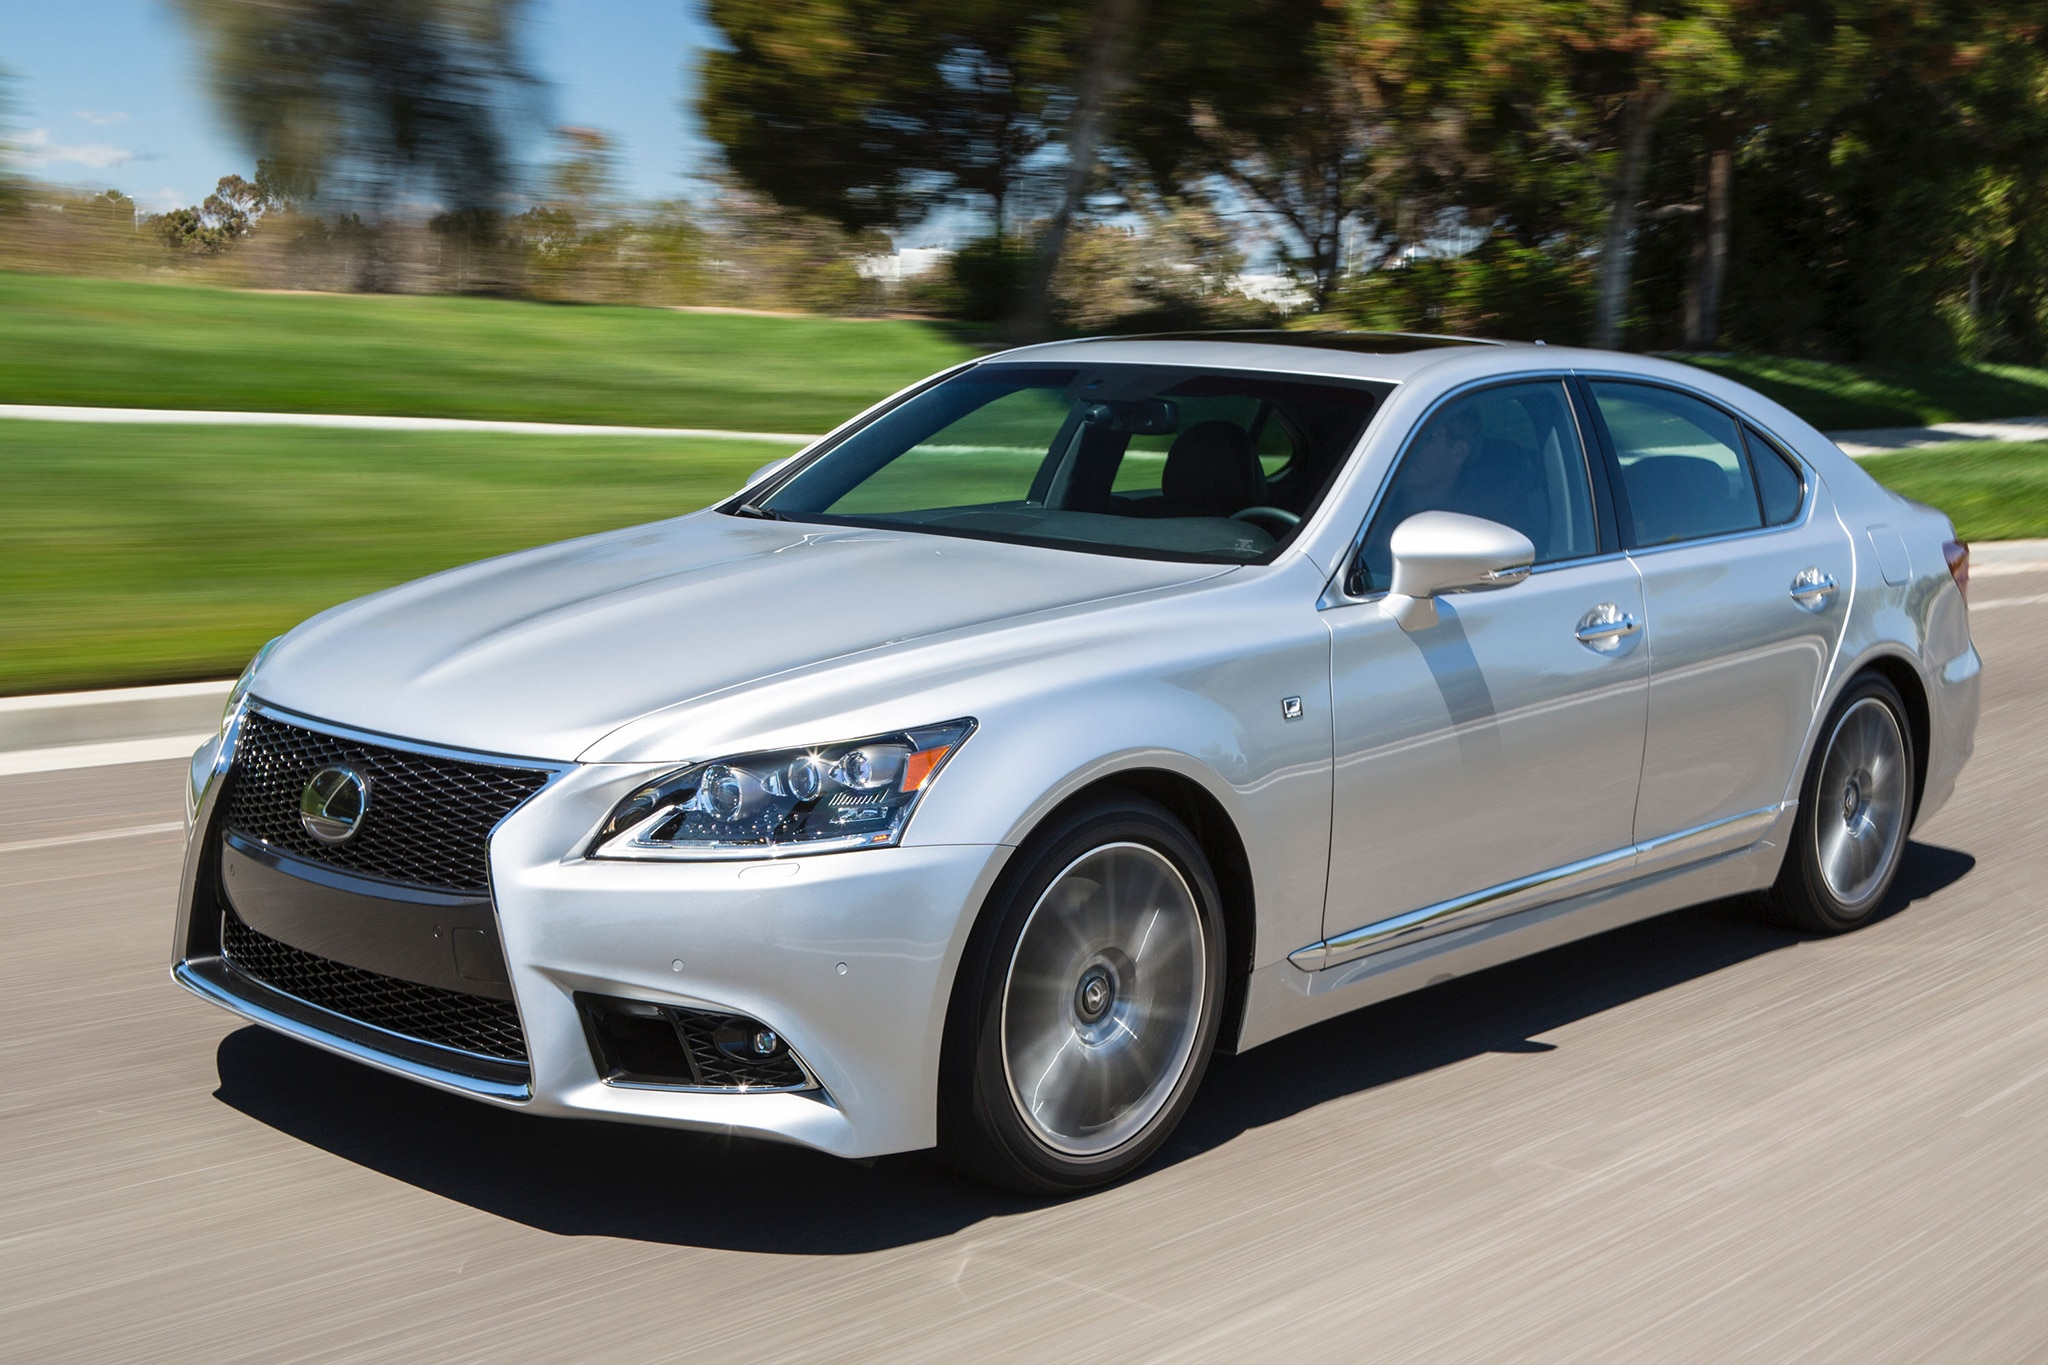 https://st.automobilemag.com/uploads/sites/10/2015/09/2013-lexus-LS-460-F-sport-front-three-quarters-view.jpg